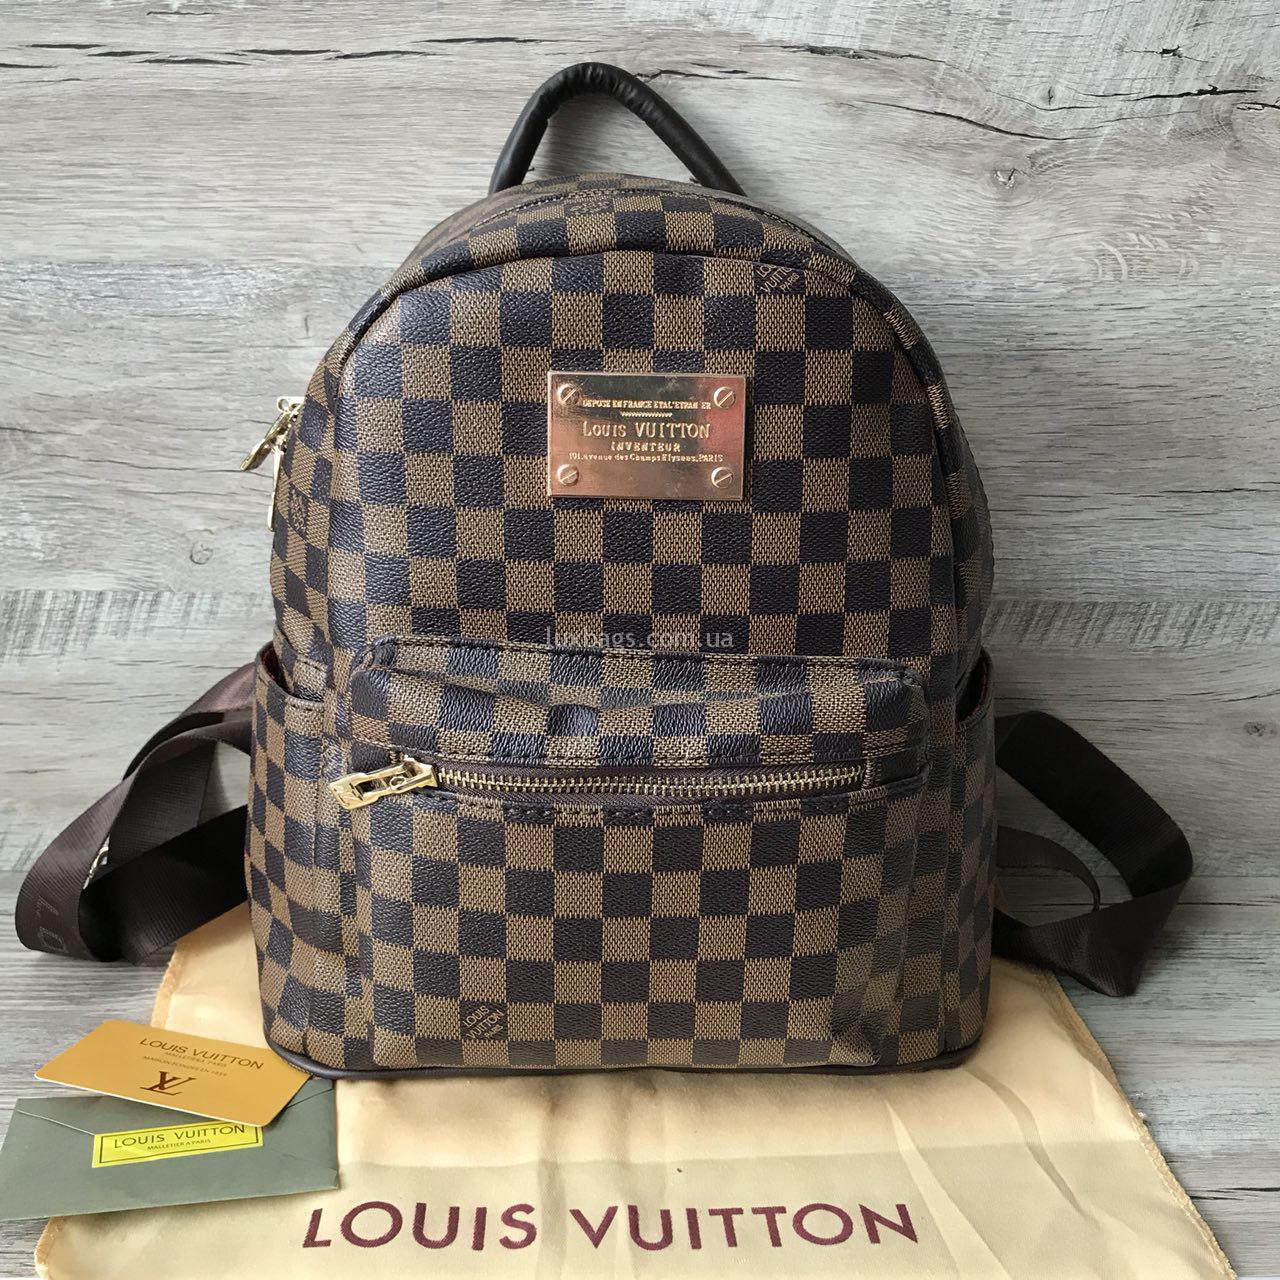 6a4a75c74ca2 Женский рюкзак Louis Vuitton (Луи Витон) Купить Недорого на Lux Bags